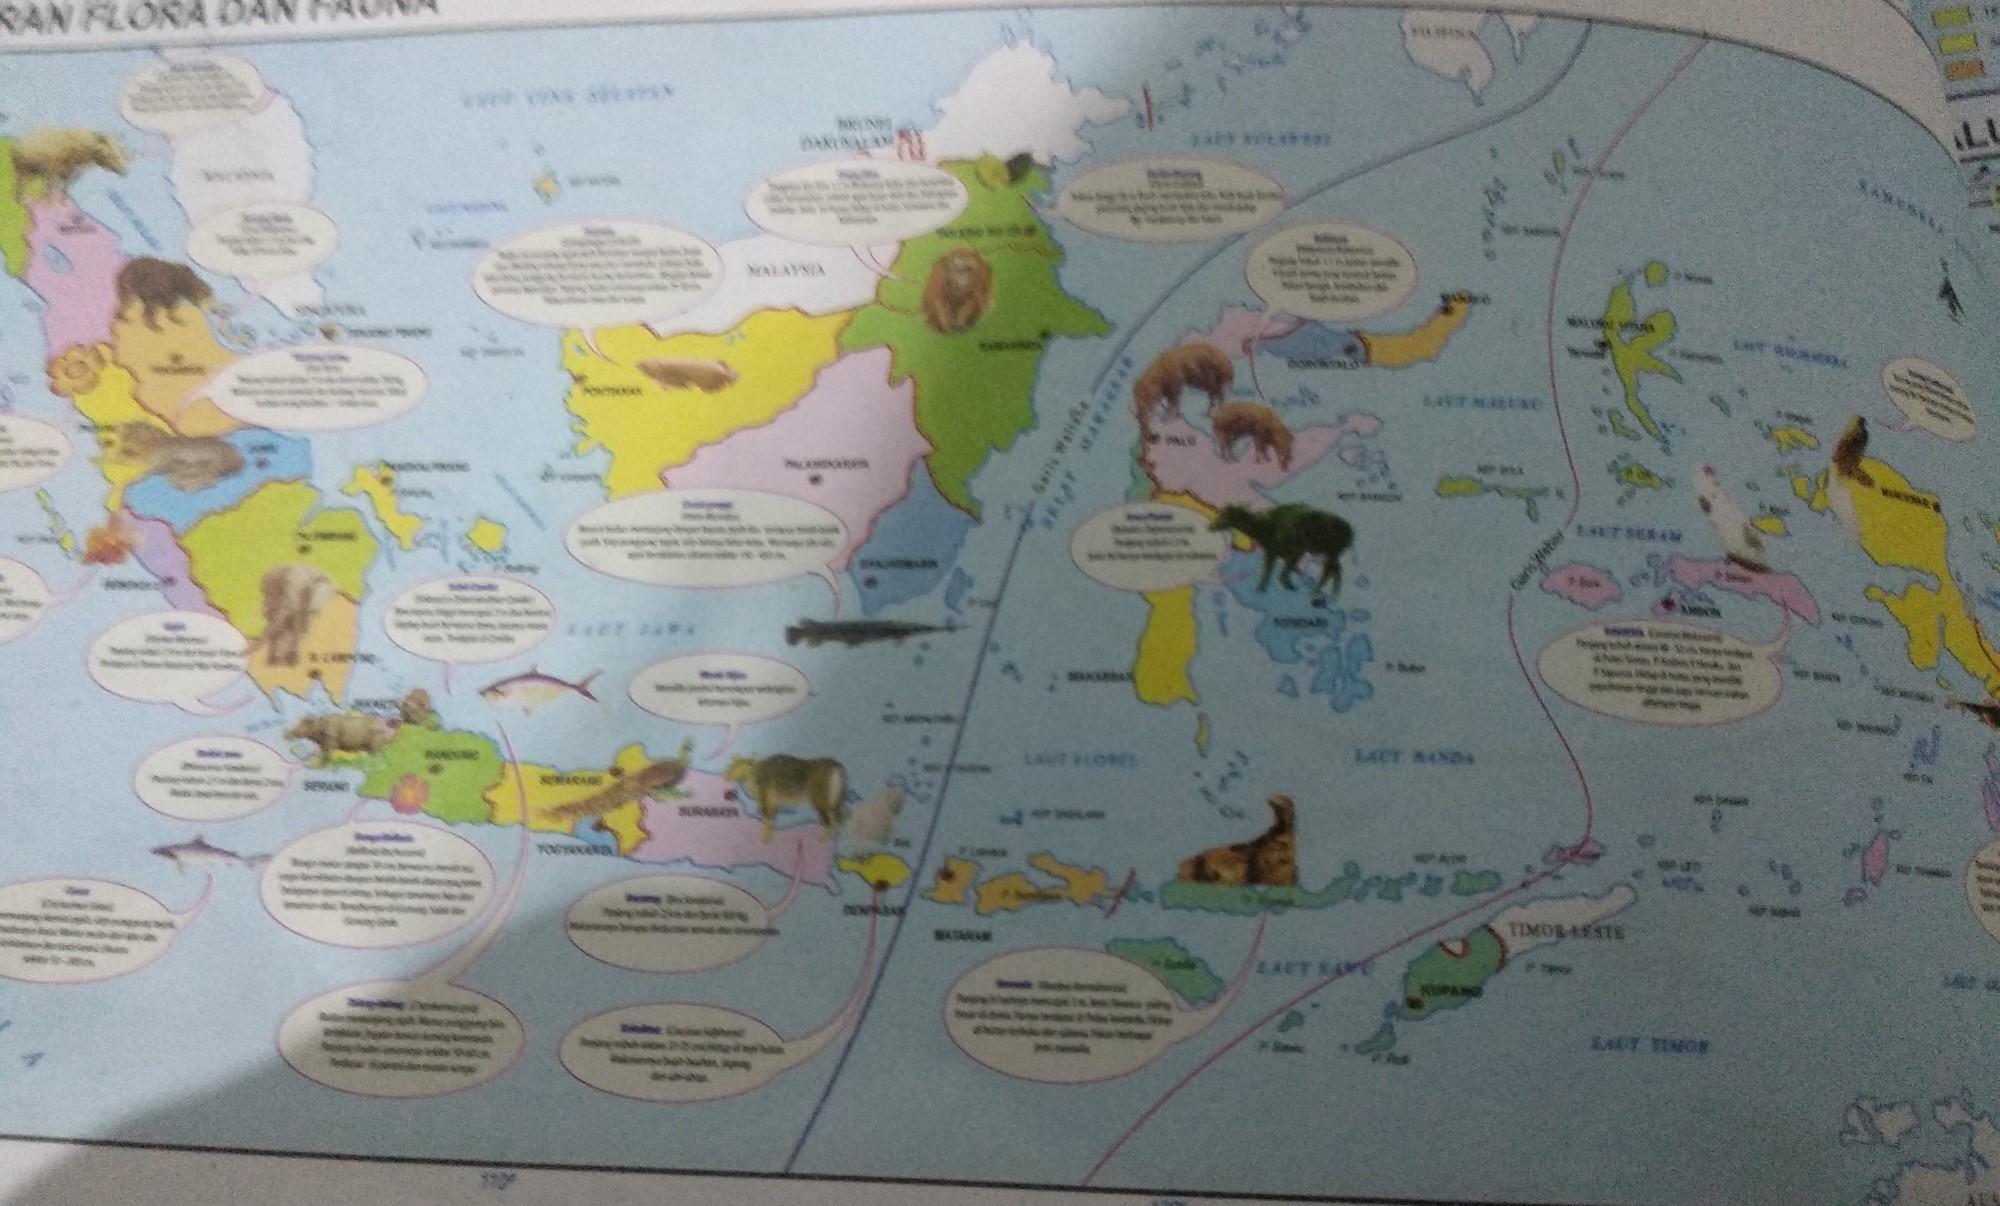 Gambrkan Peta Persebaran Fauna Di Indonesia Beserta Garis Pembatasny Brainly Co Id